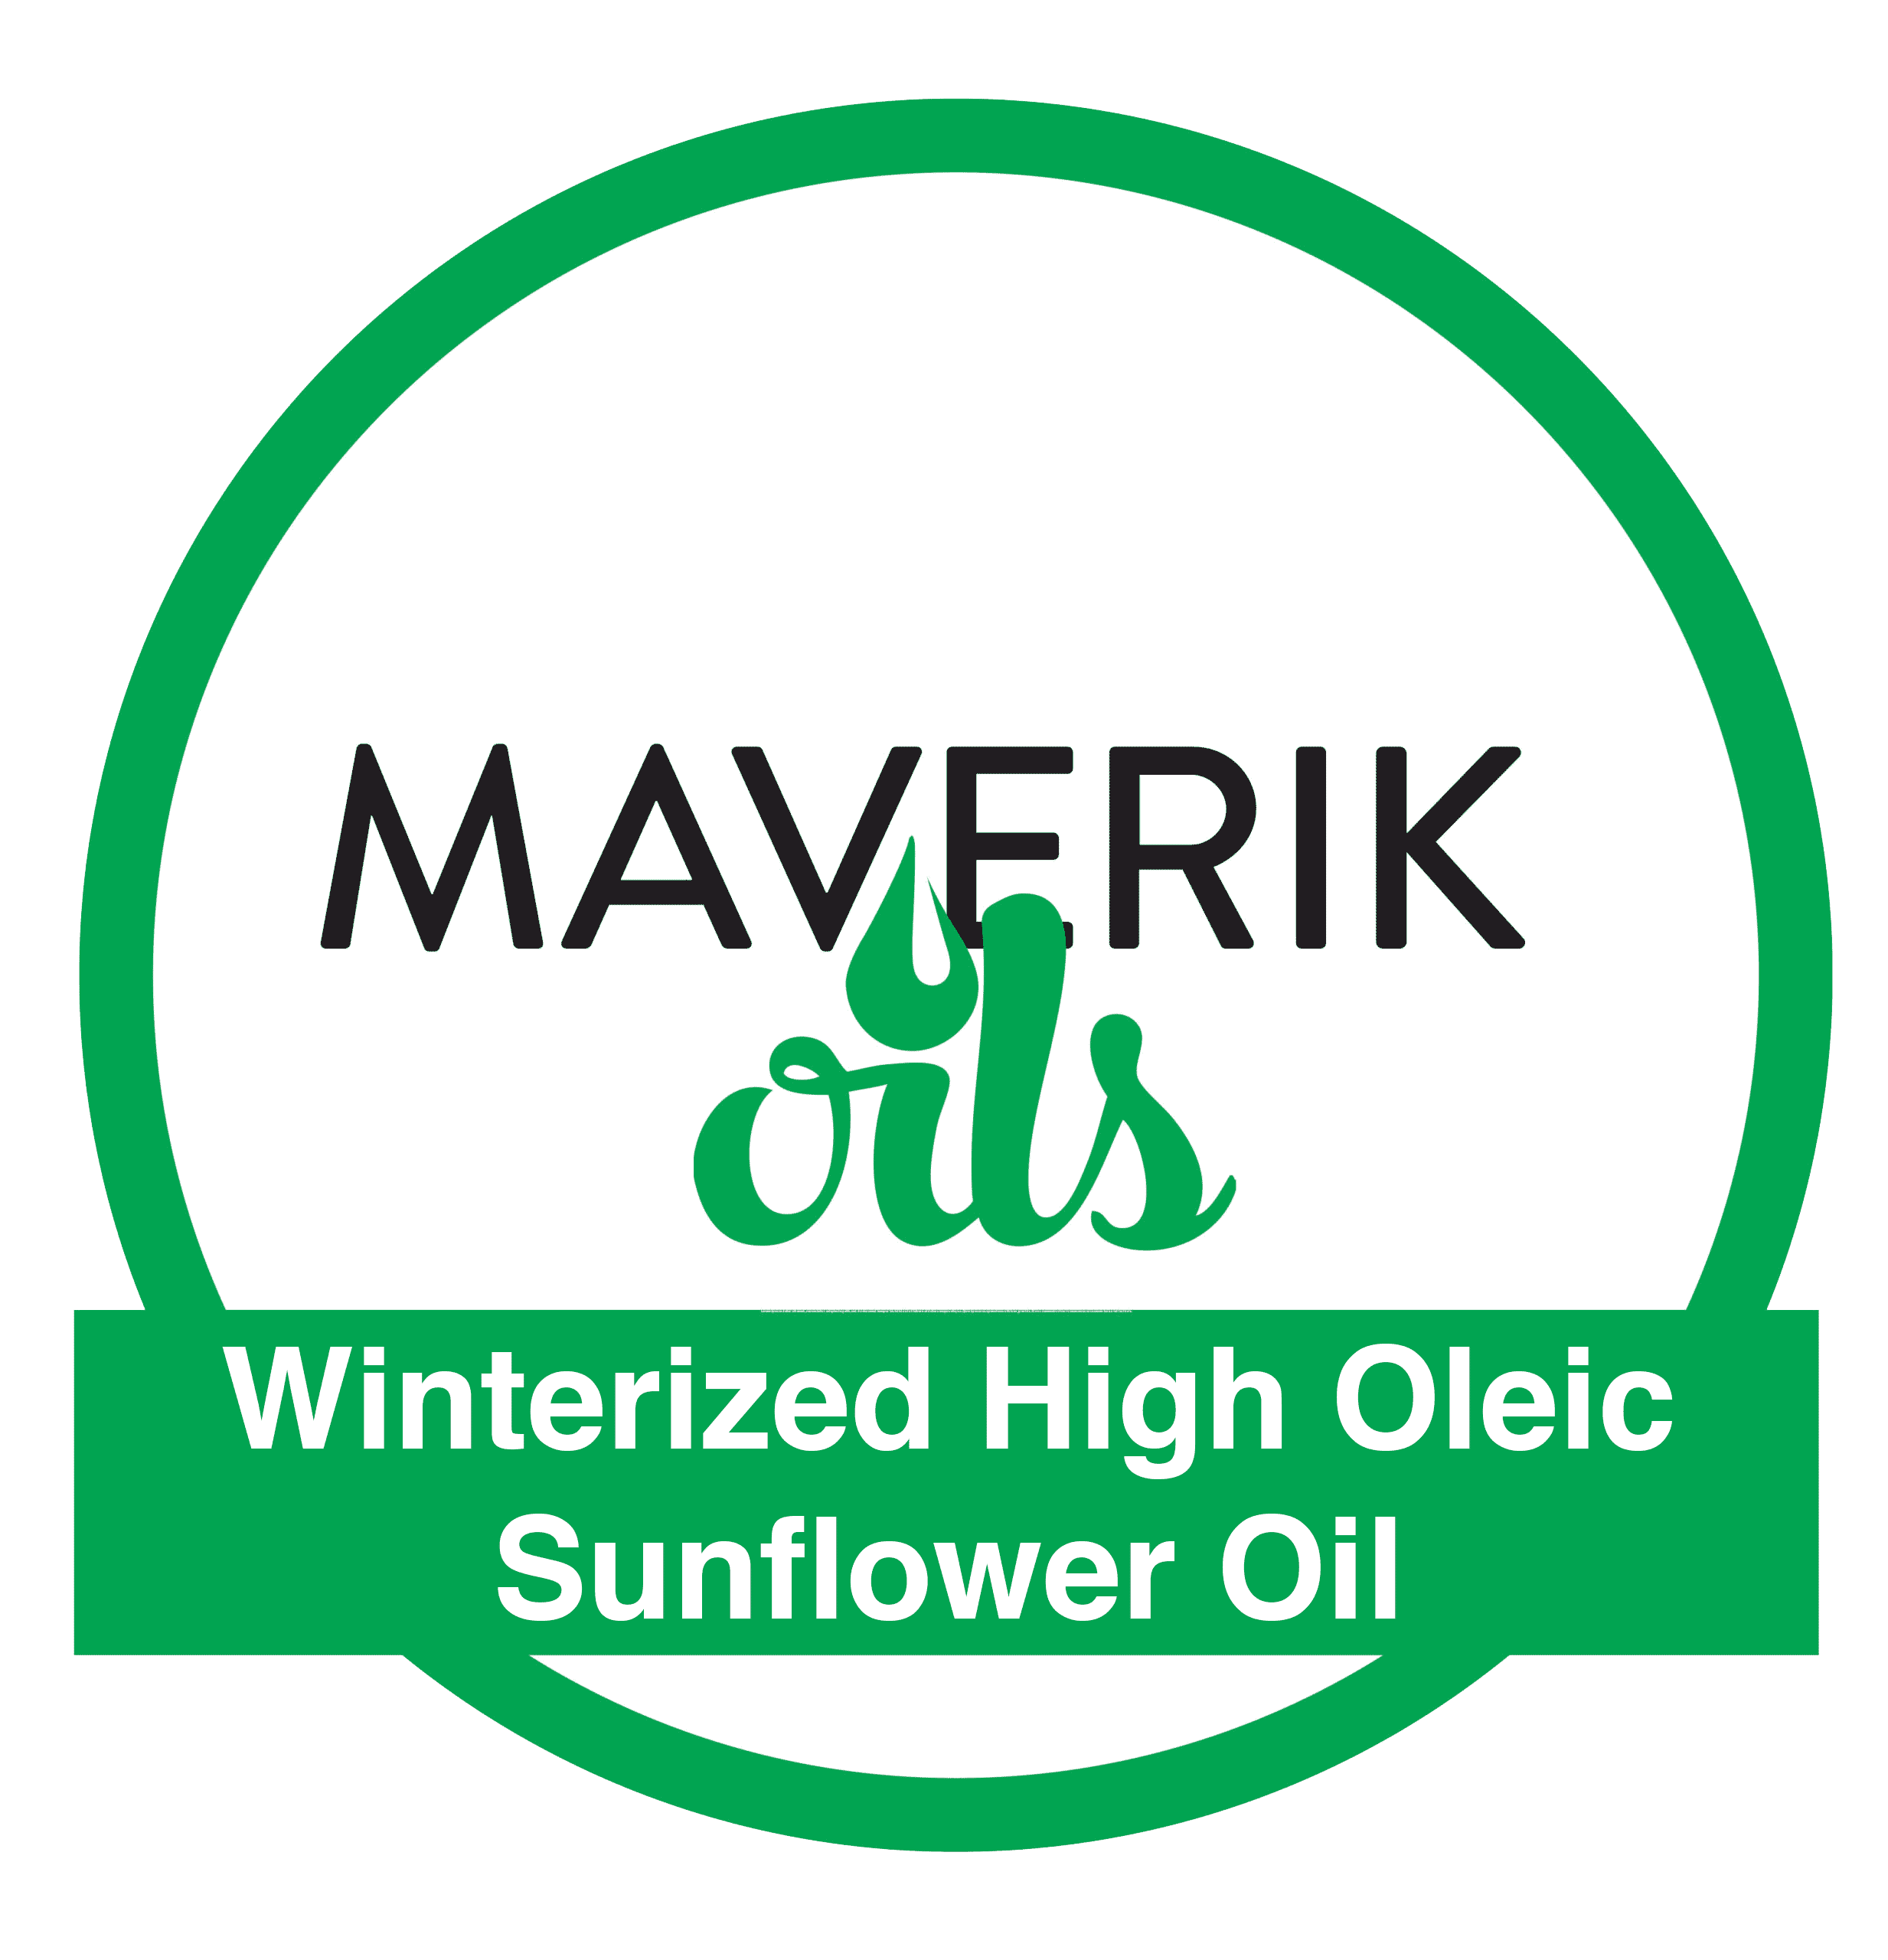 Winterized High Oleic Sunflower Oil